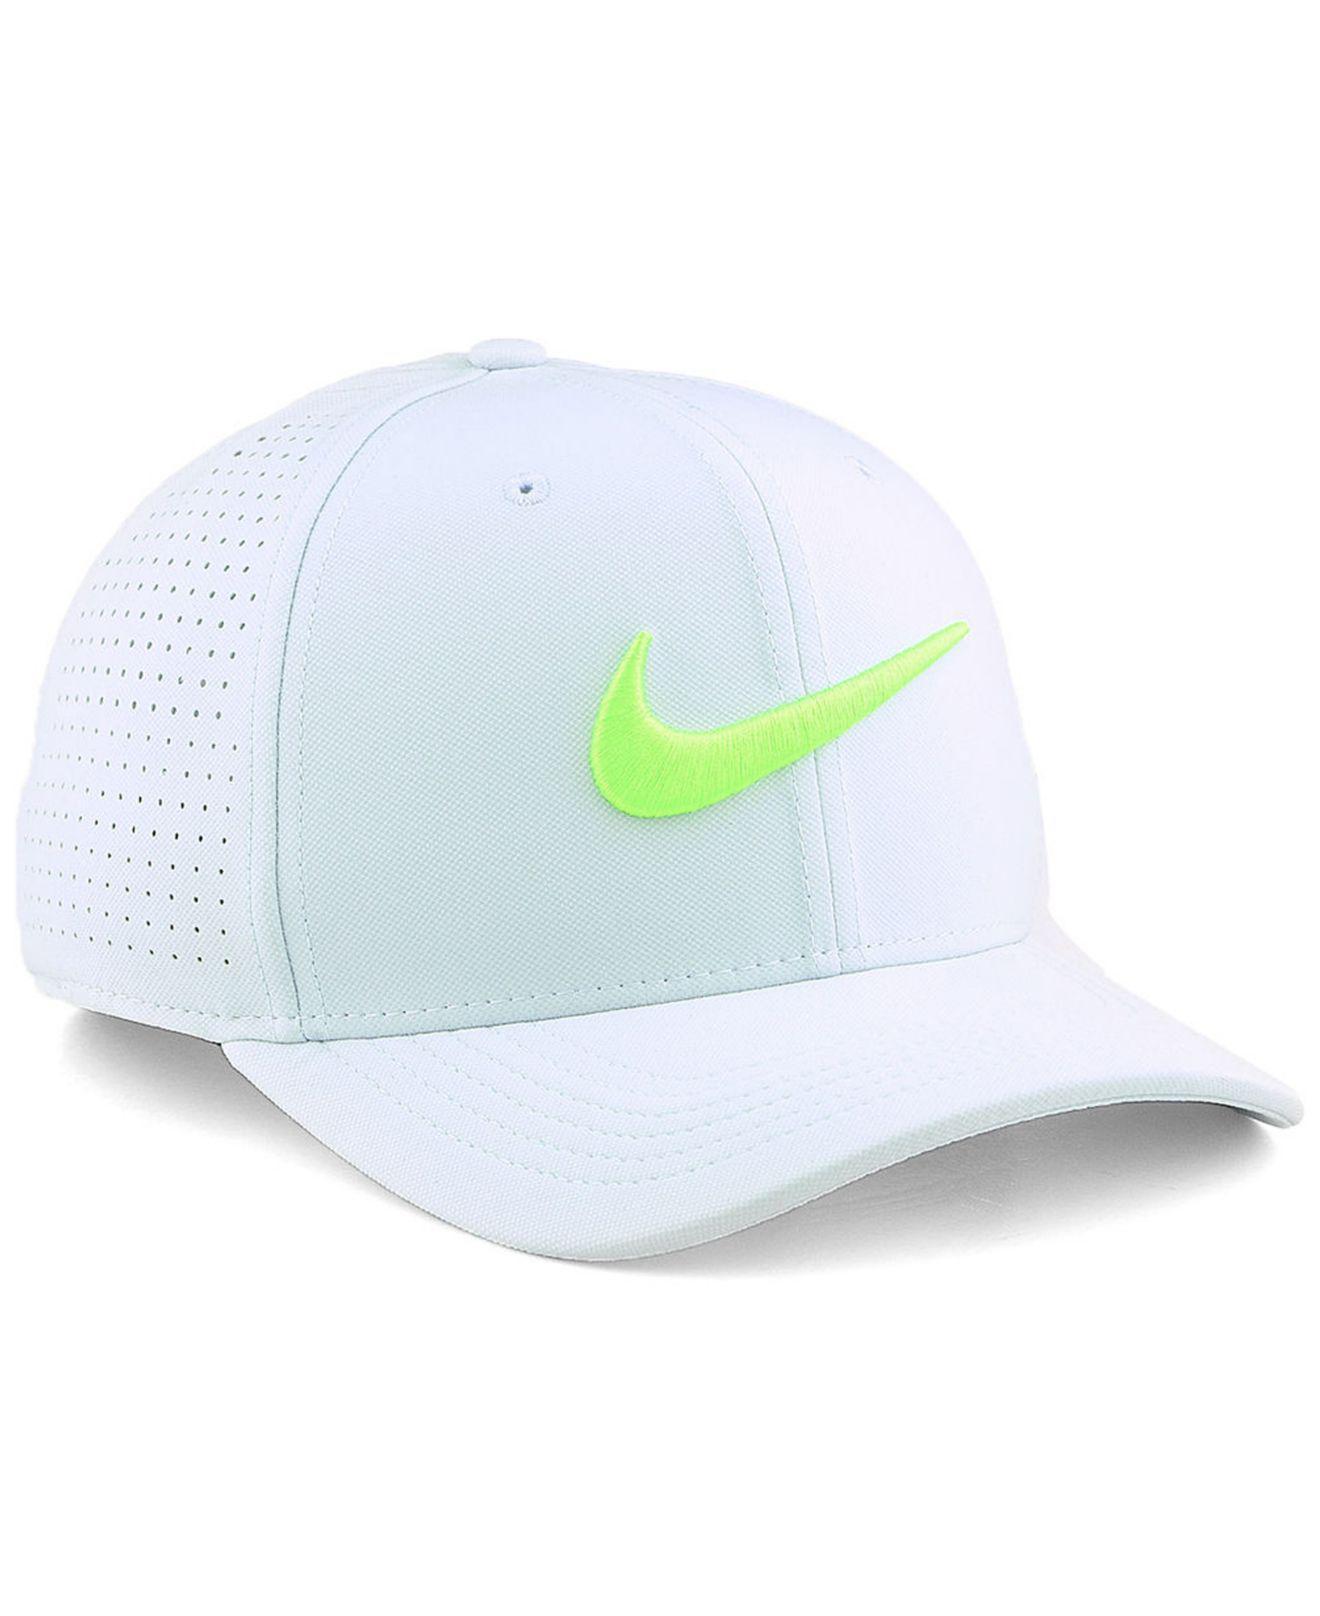 ... best price lyst nike vapor flex ii cap in green for men 32605 f94c5 580fd0f5c797